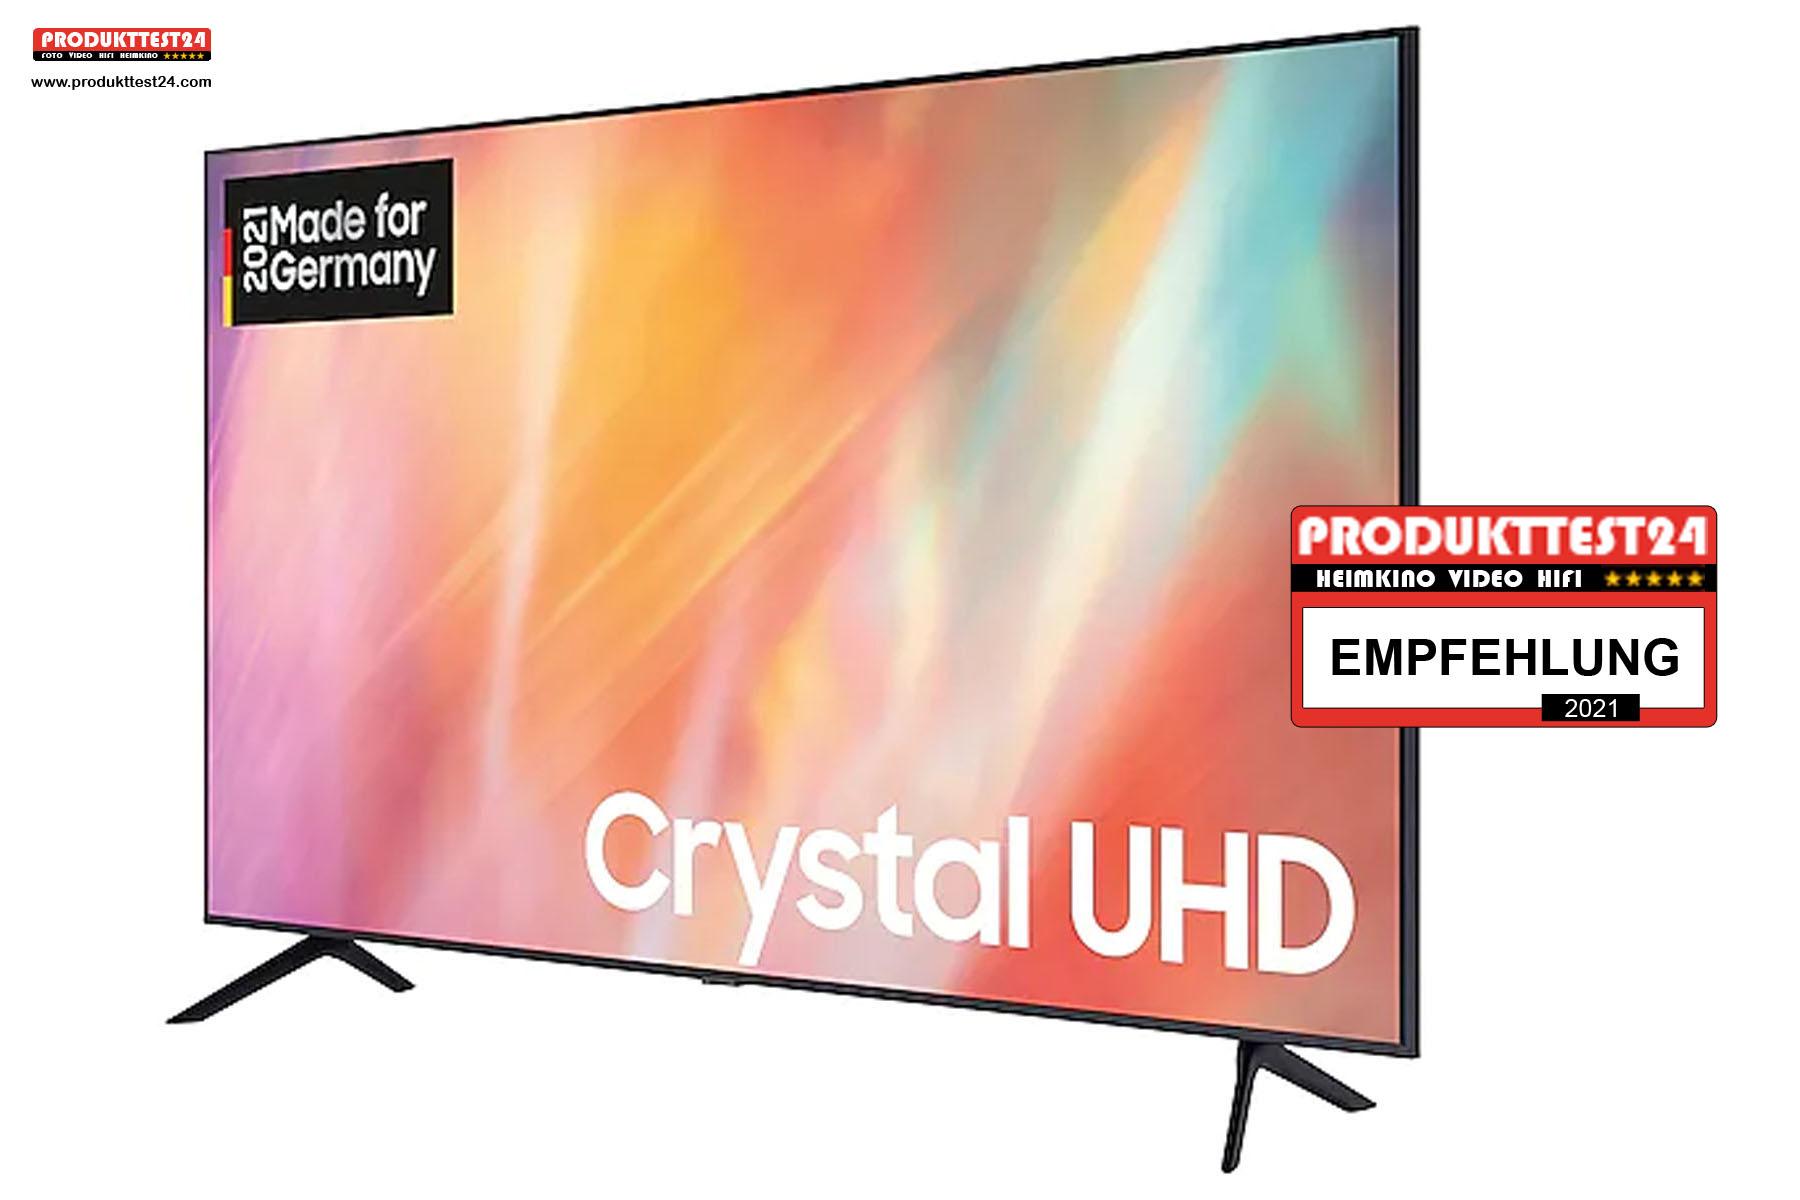 Der 43 Zoll große Samsung GU43AU7179 Crystal UHD Fernseher